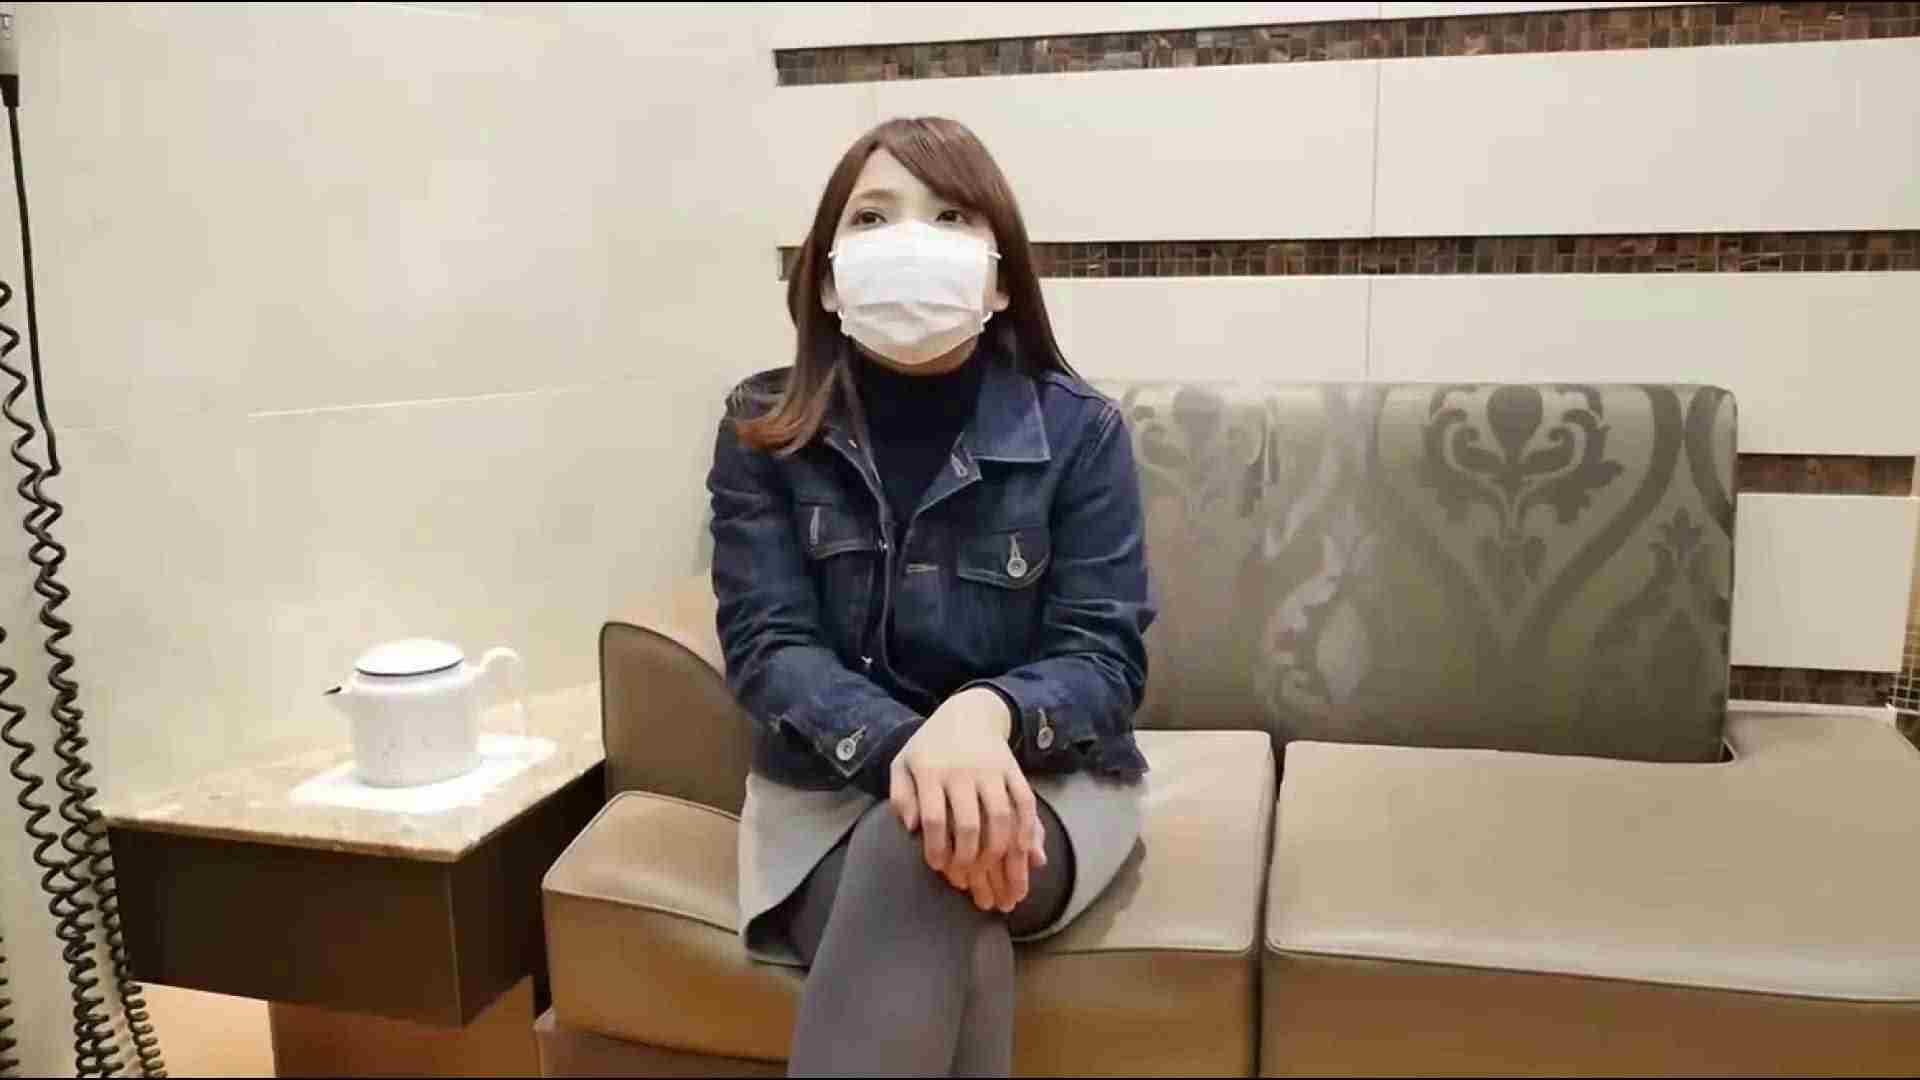 S級厳選美女ビッチガールVol.41 前編 OL女体   美女  105連発 27